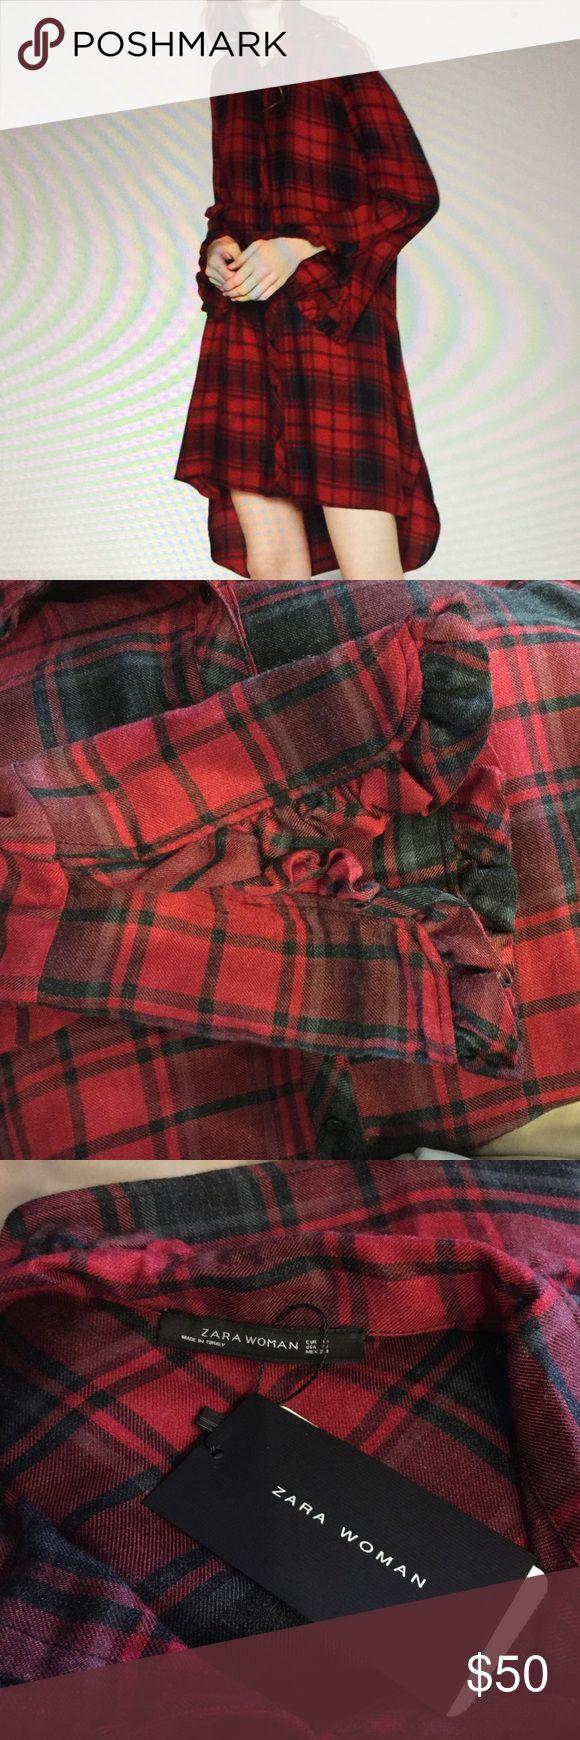 Selling this Zara checkered tunic dress with frills. Size M on Poshmark! My username is: wildtimetoys. #shopmycloset #poshmark #fashion #shopping #style #forsale #Zara #Tops